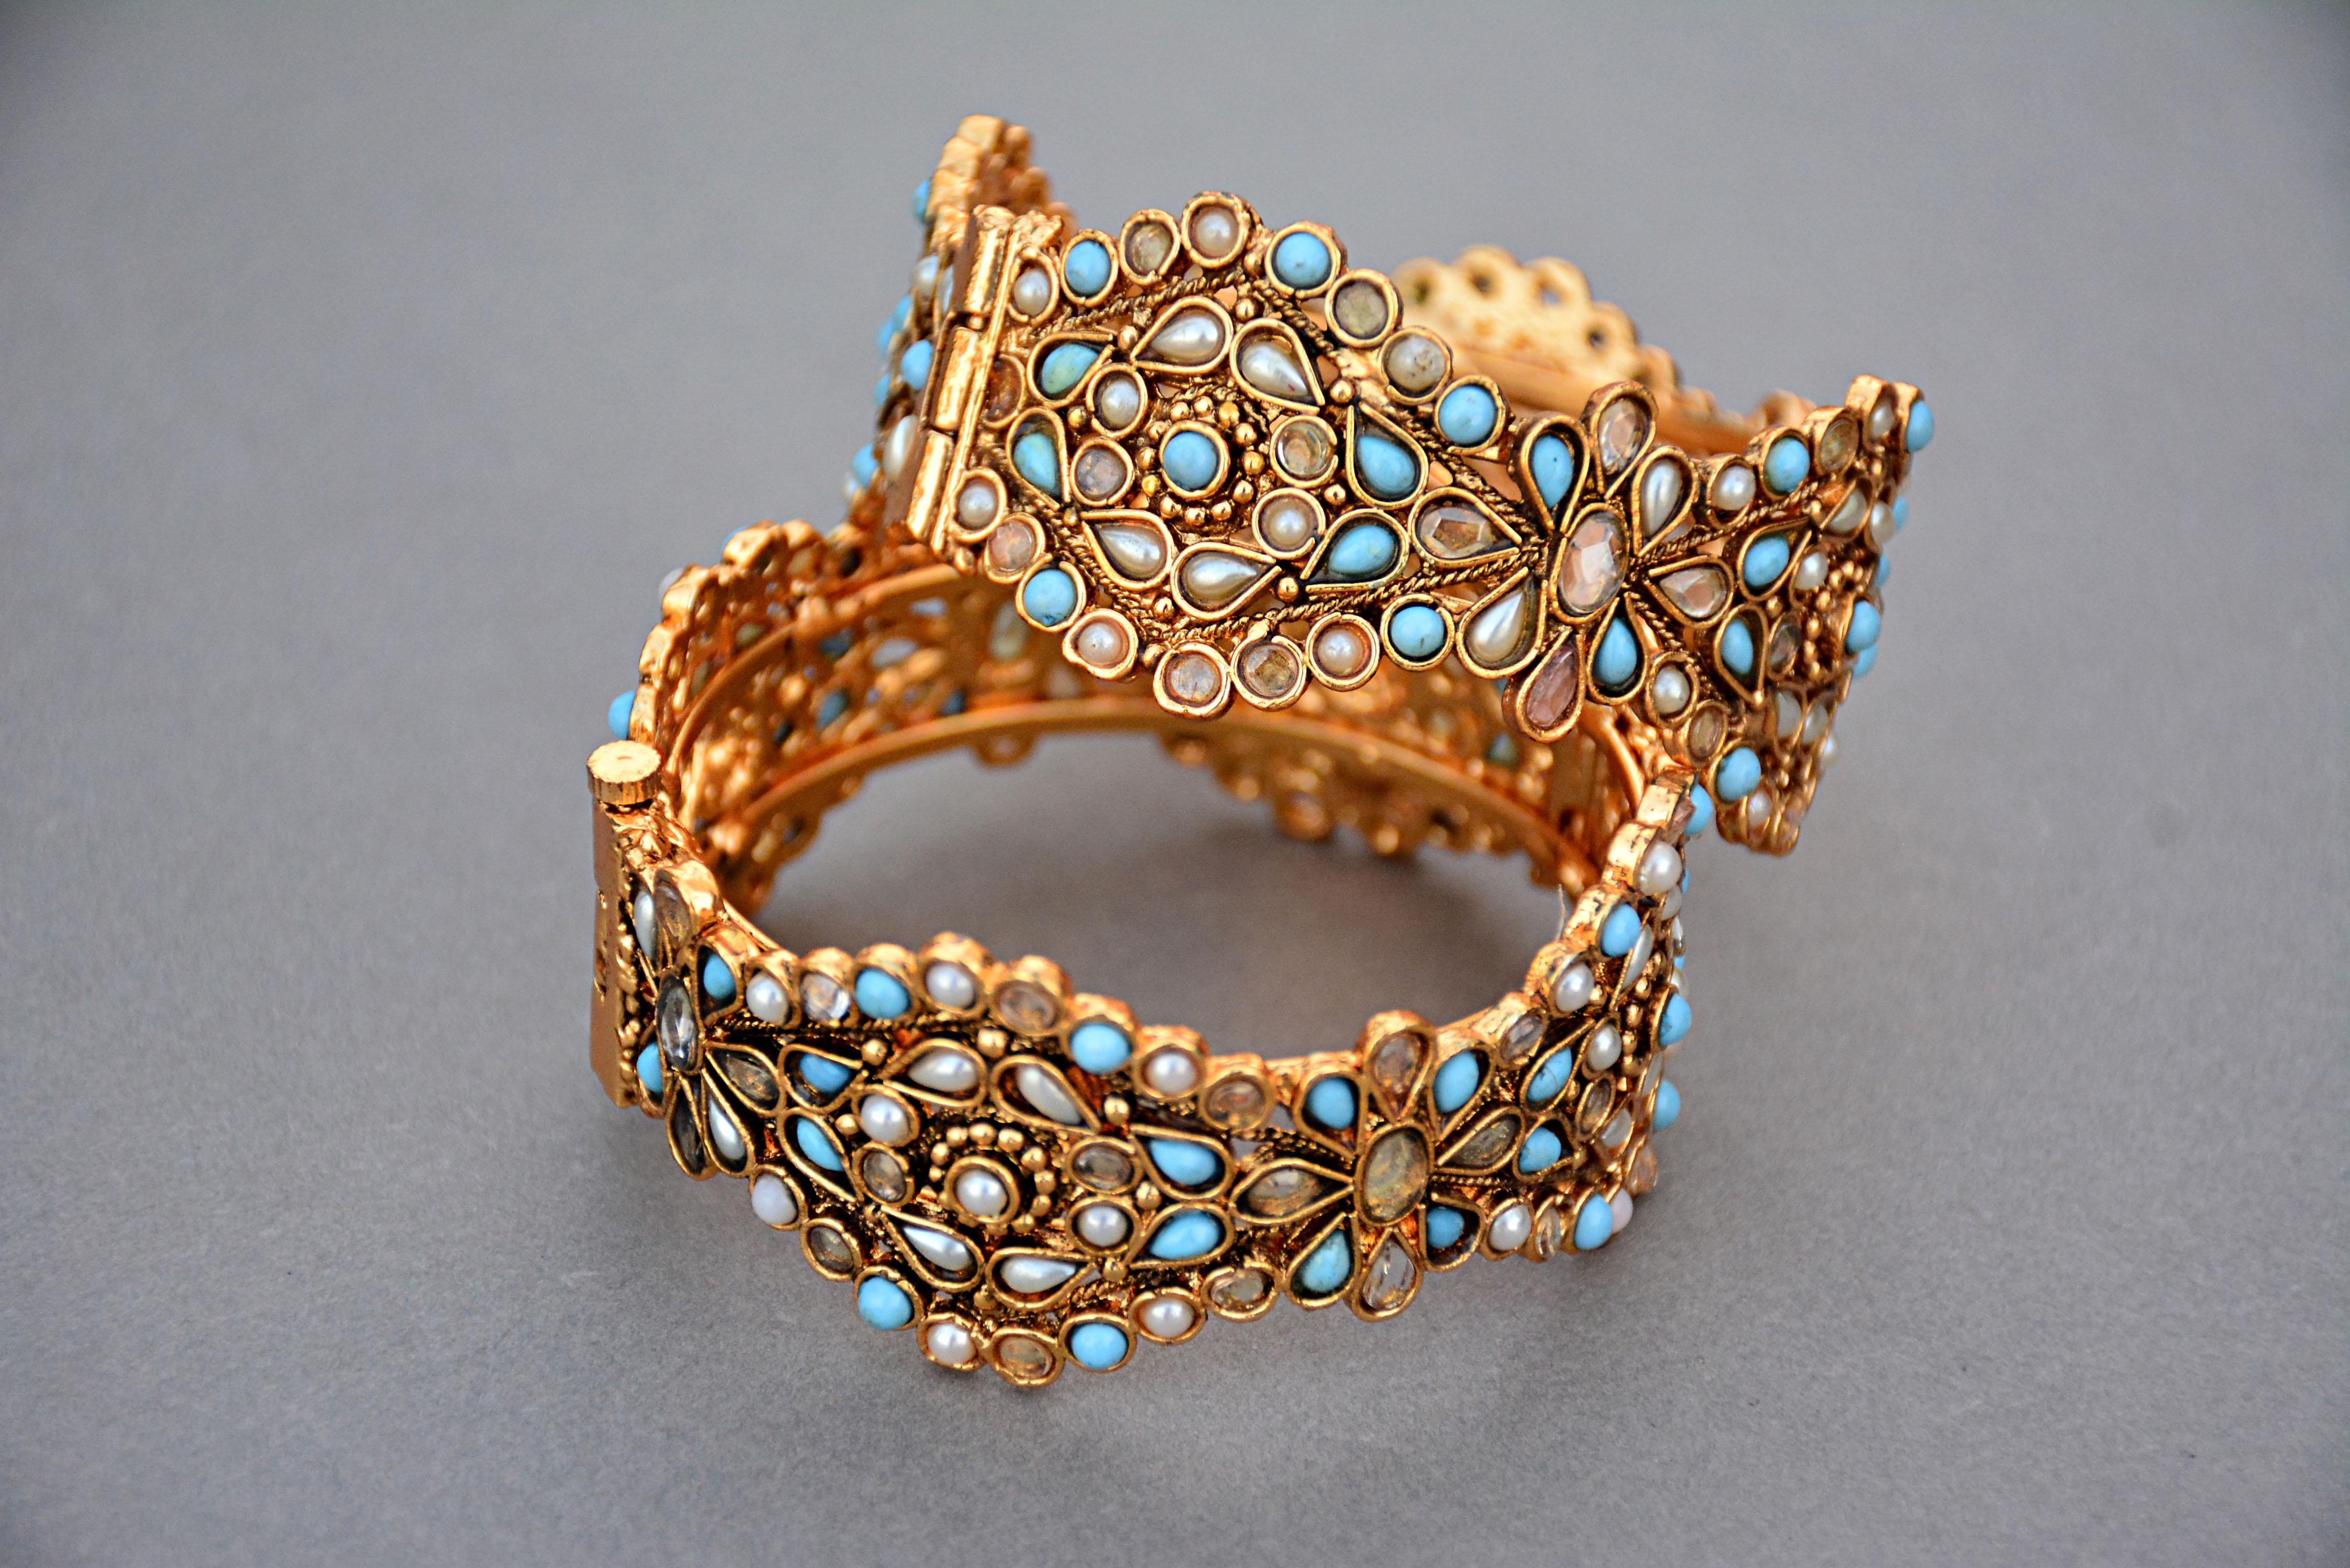 Free Images : golden, bangle, bracelet, jewellery, gold